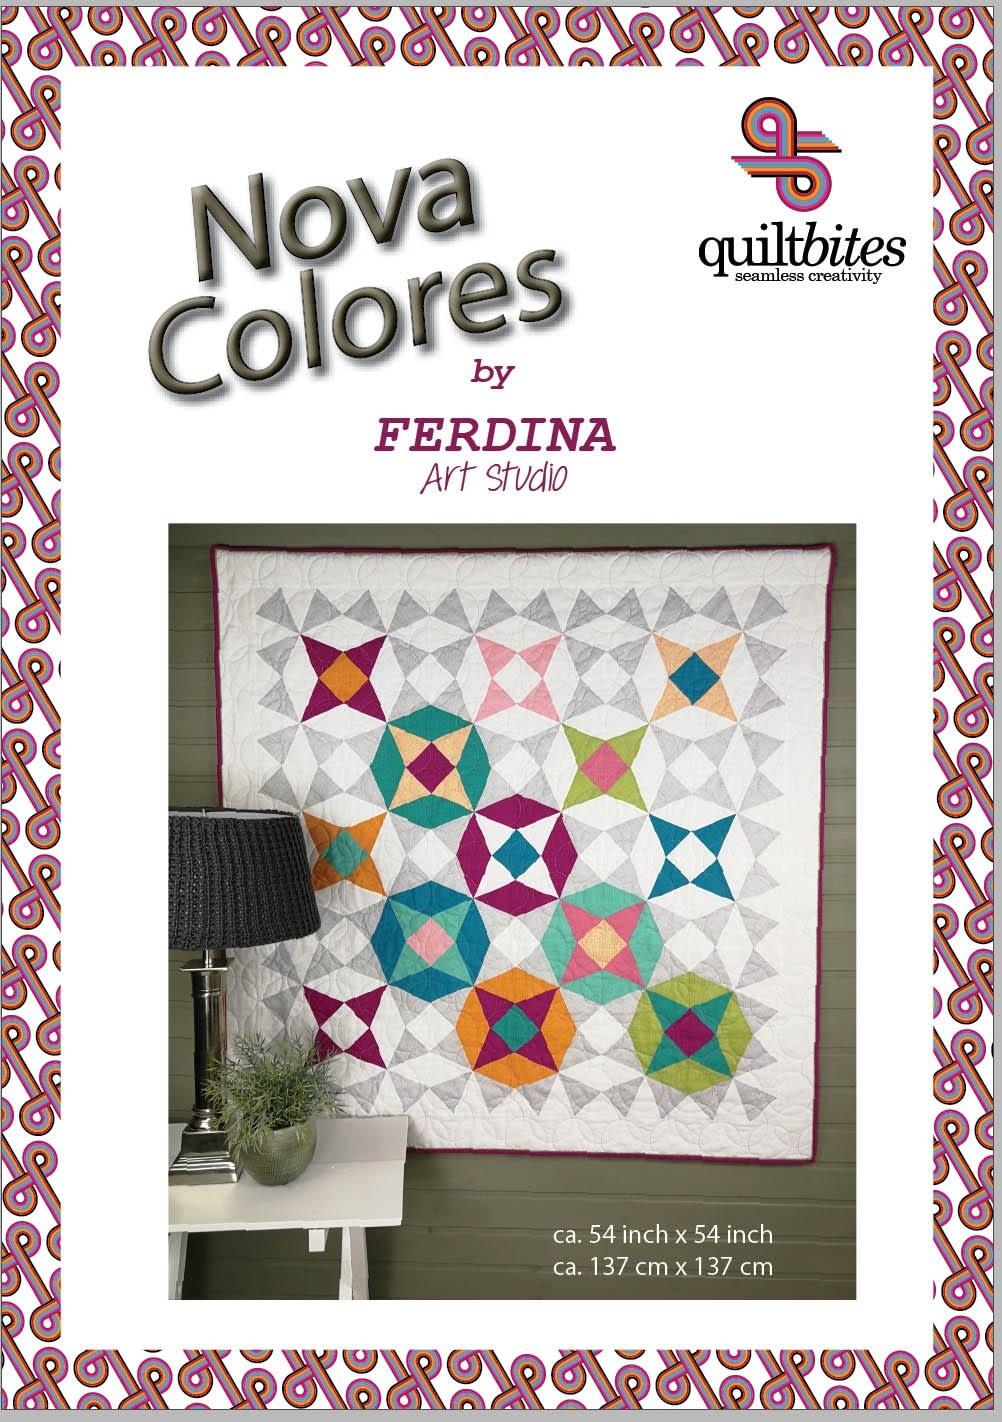 Nova Colores quilt patroon